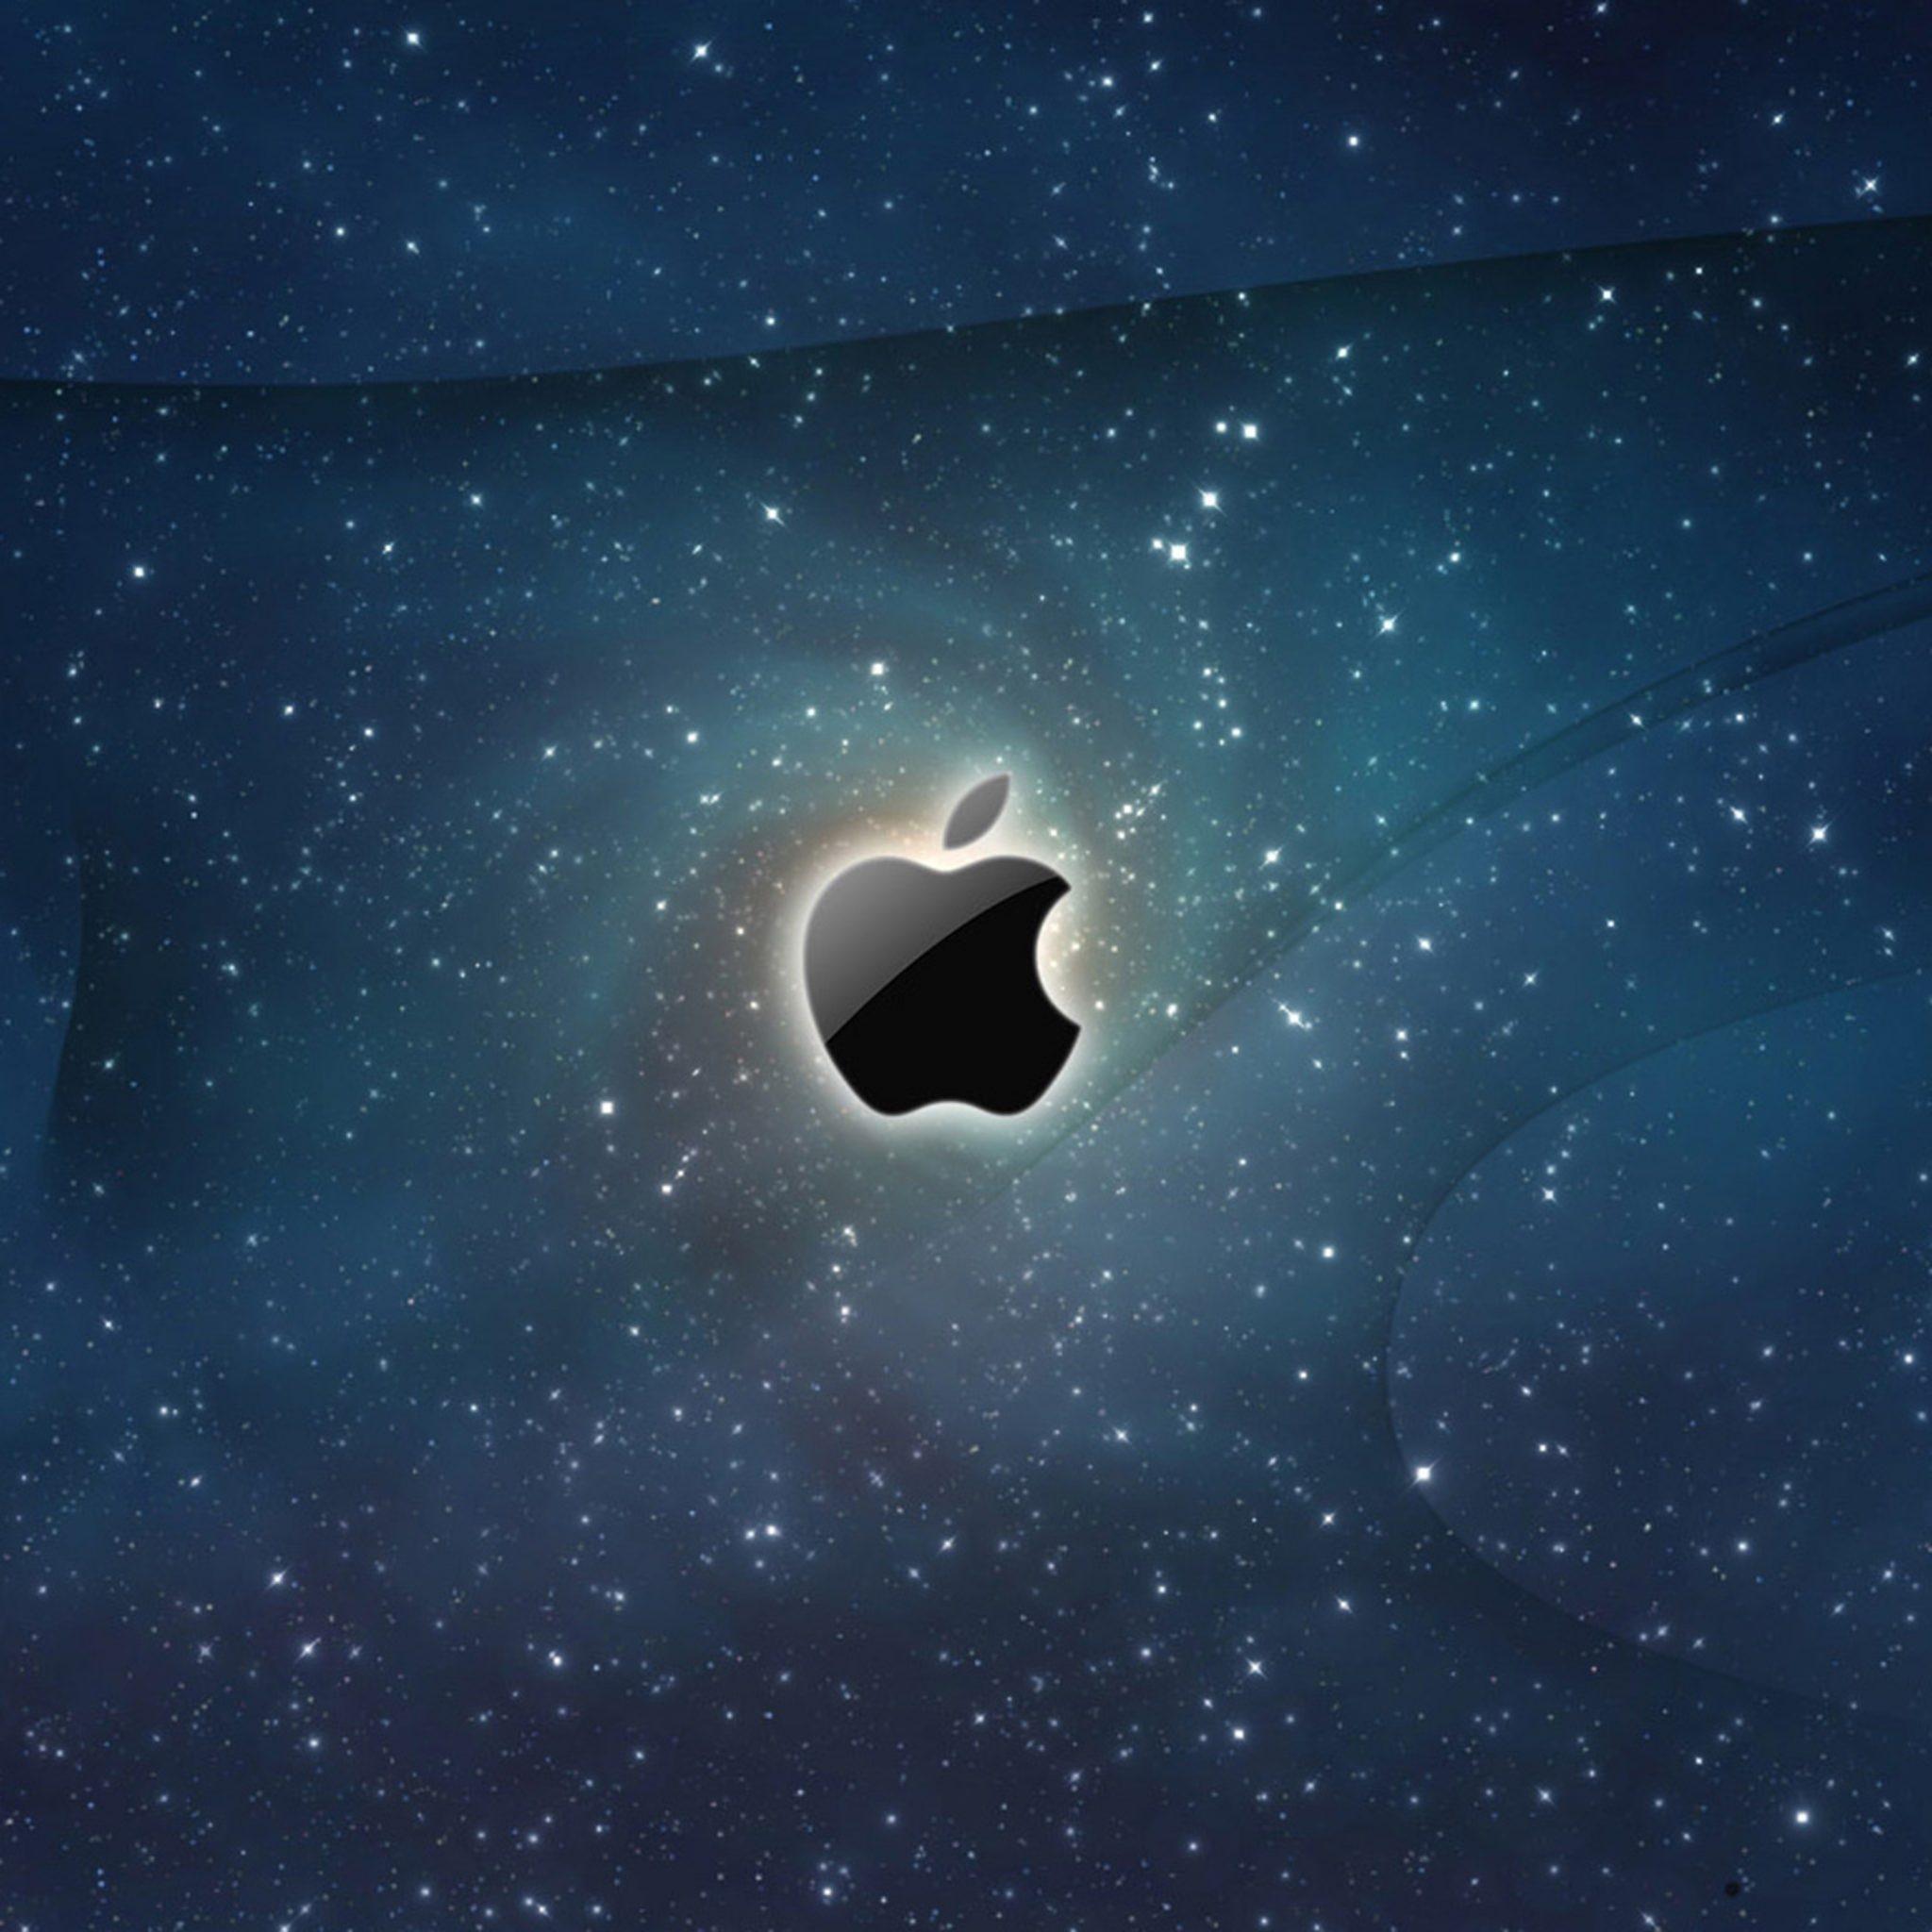 2048x2048 wallpapers iPad retina Apple Space Ipad Wallpaper 2048x2048 pixels resolution